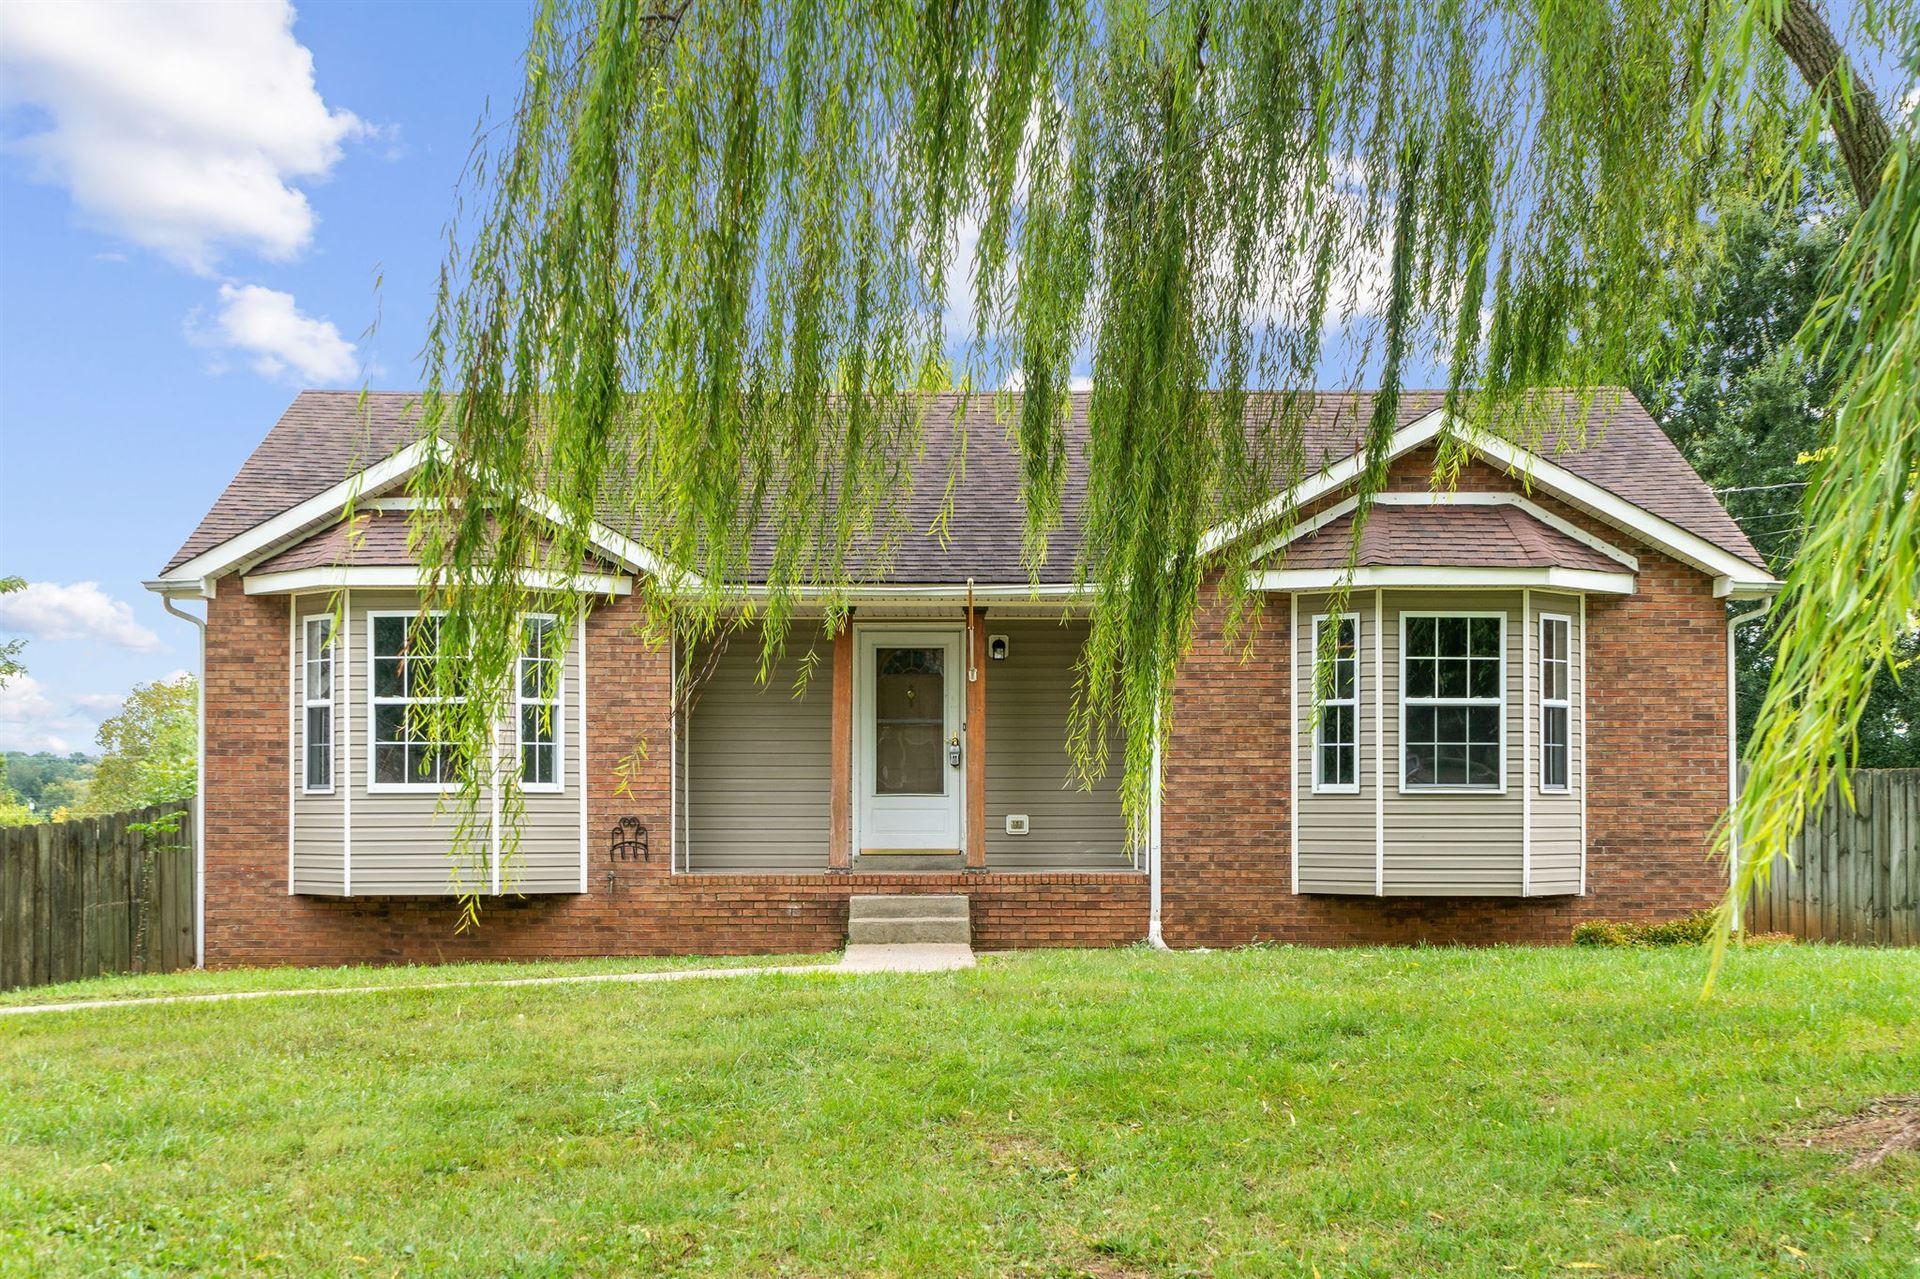 1328 Meredith Way, Clarksville, TN 37042 - MLS#: 2201402